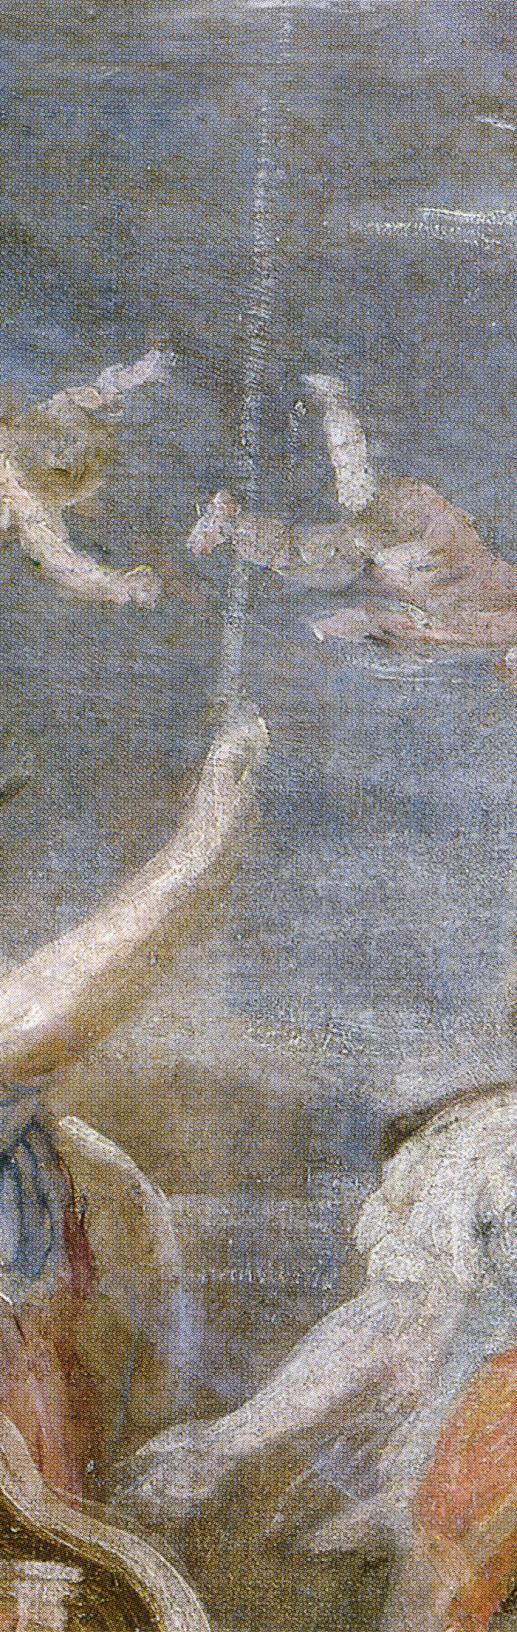 Velazquez 1657 las_hilanderas detail Minerve Prado